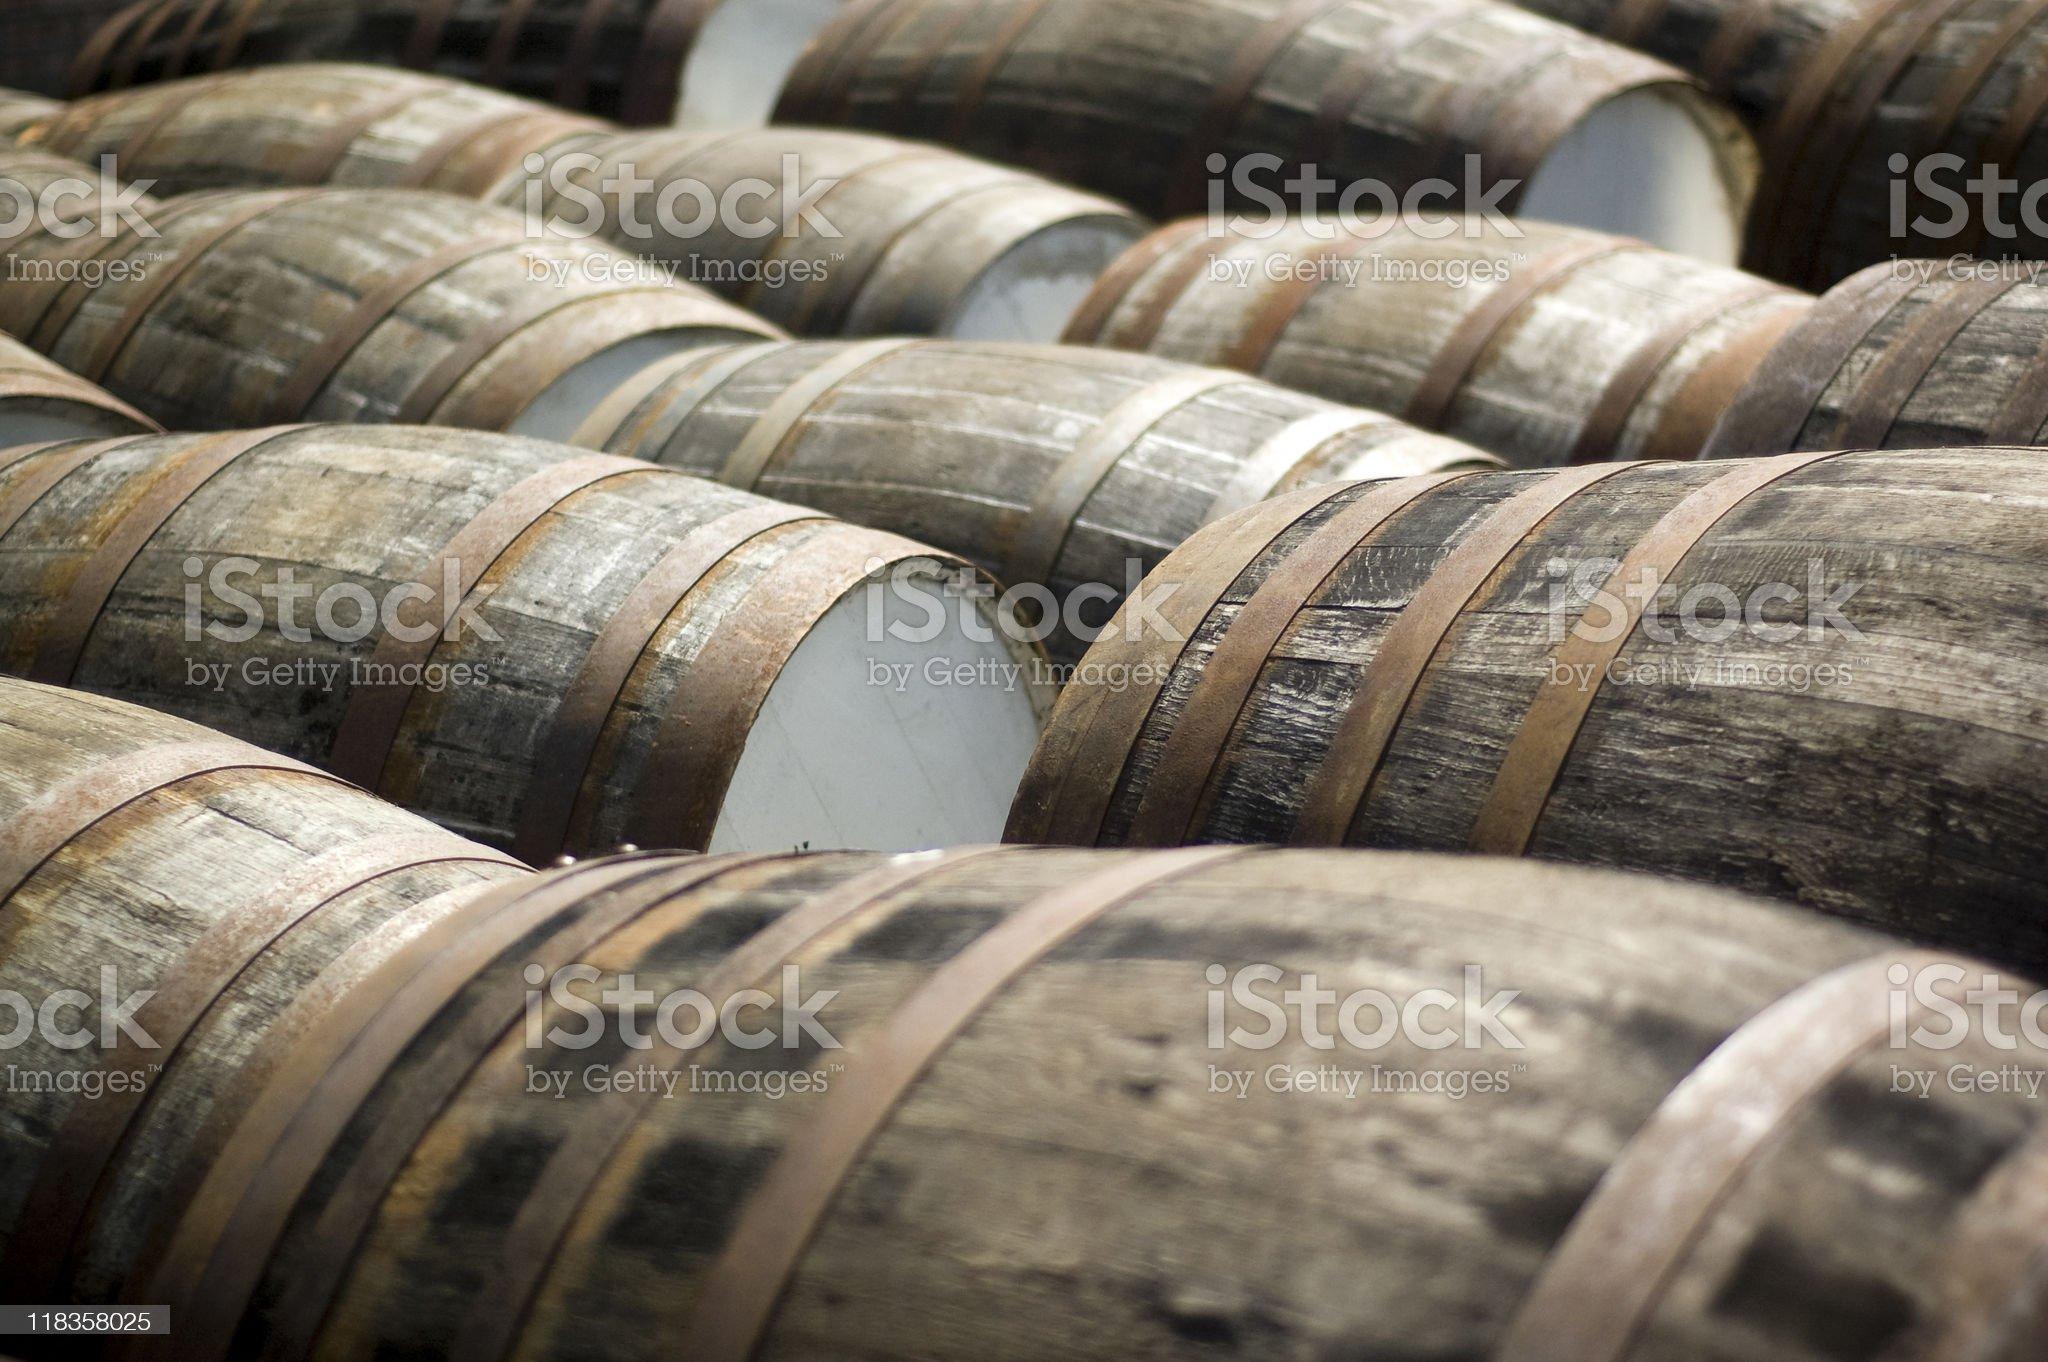 Scotch Whisky Barrels royalty-free stock photo